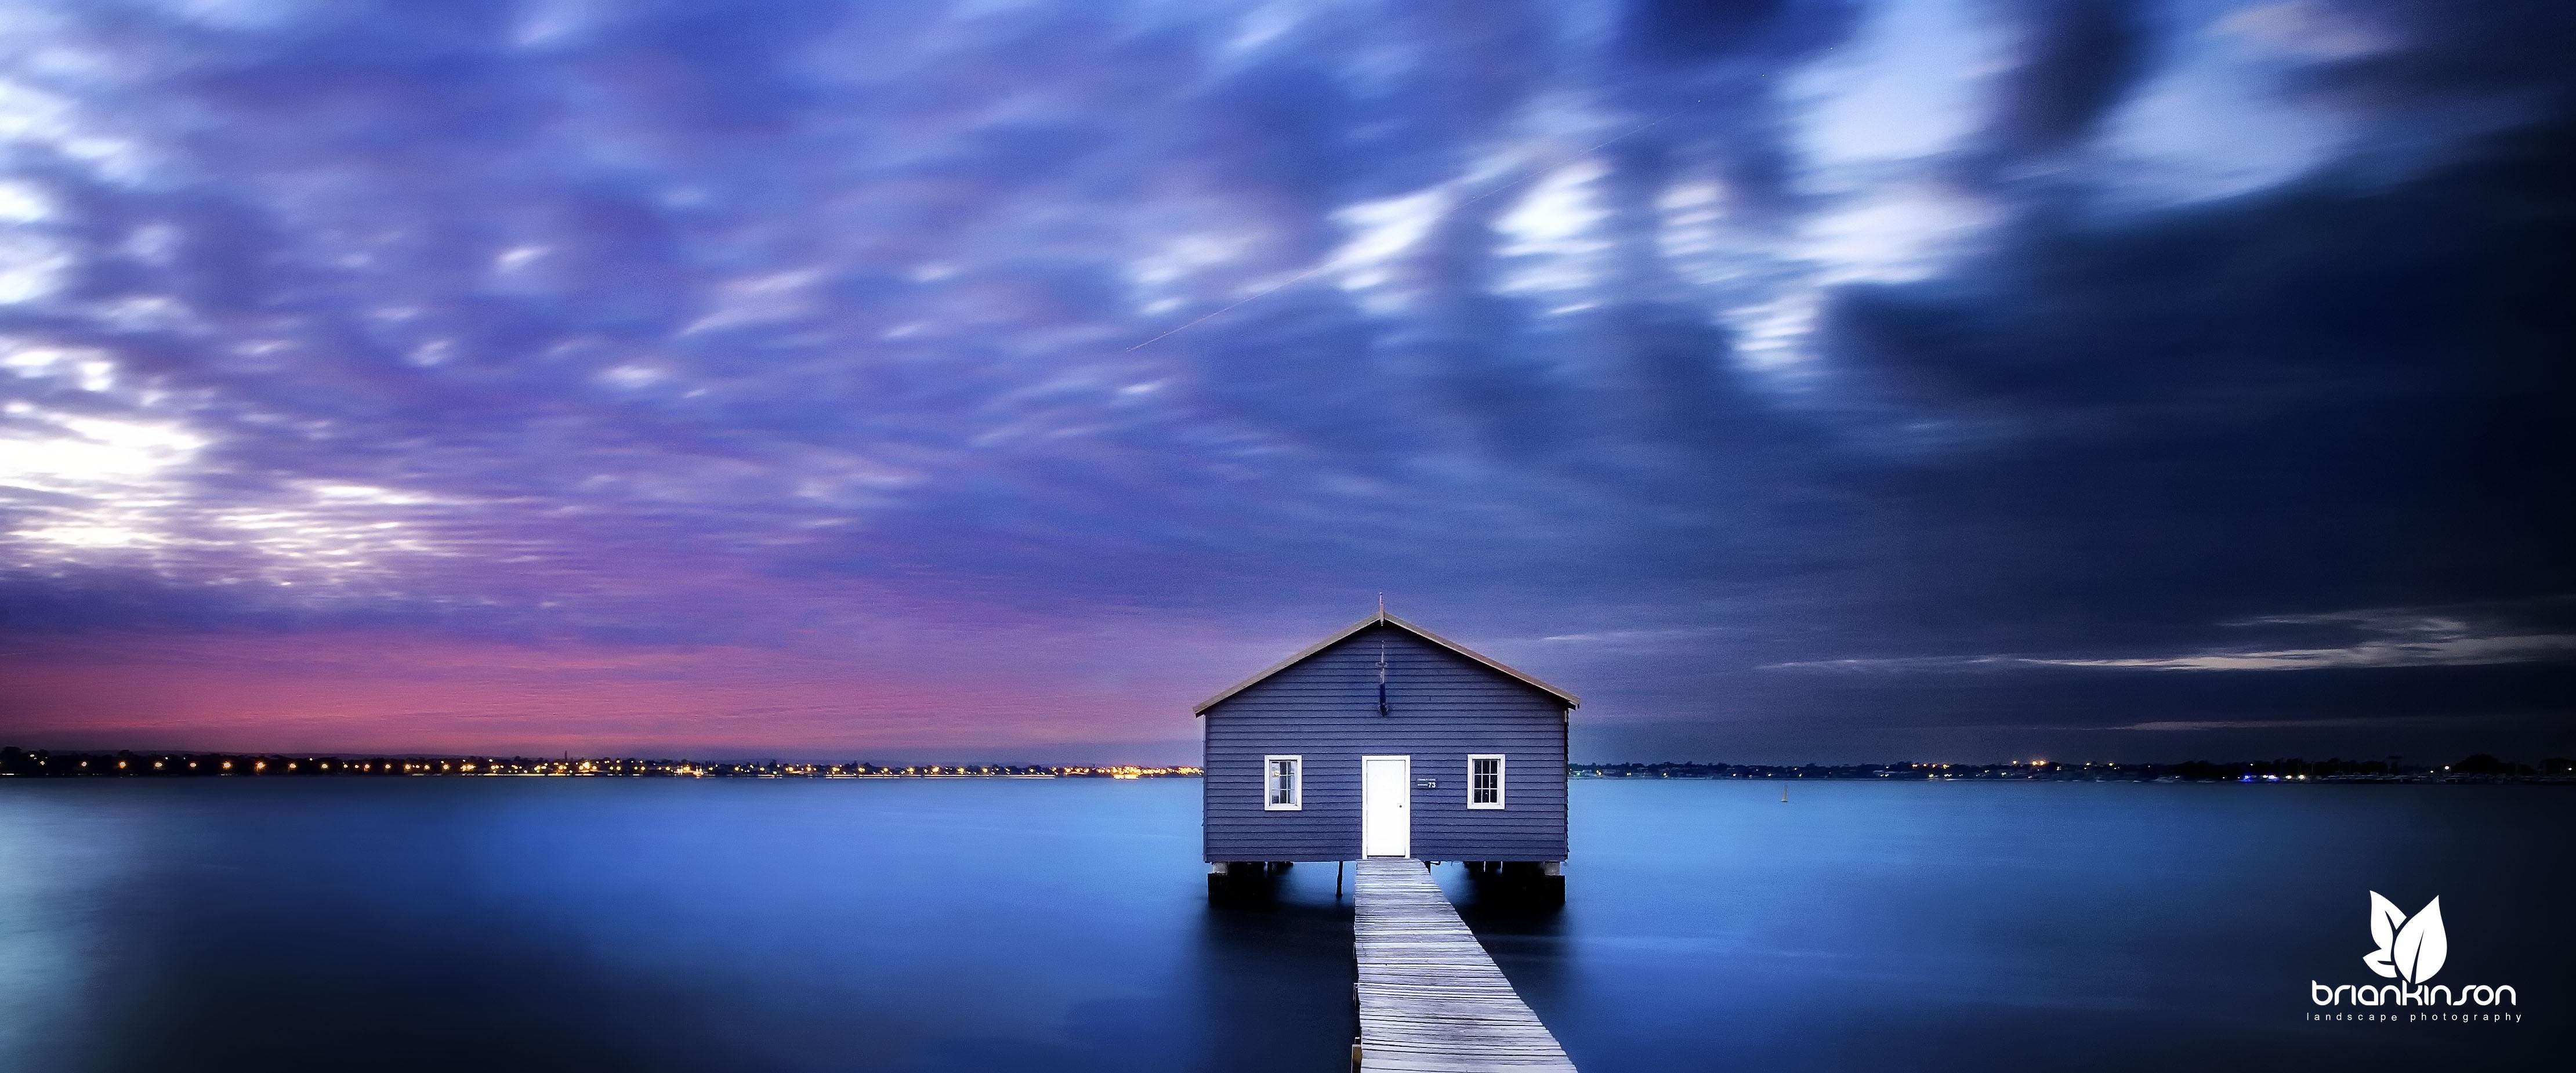 City of south perth south perth wa australia sunrise for Serenity house perth